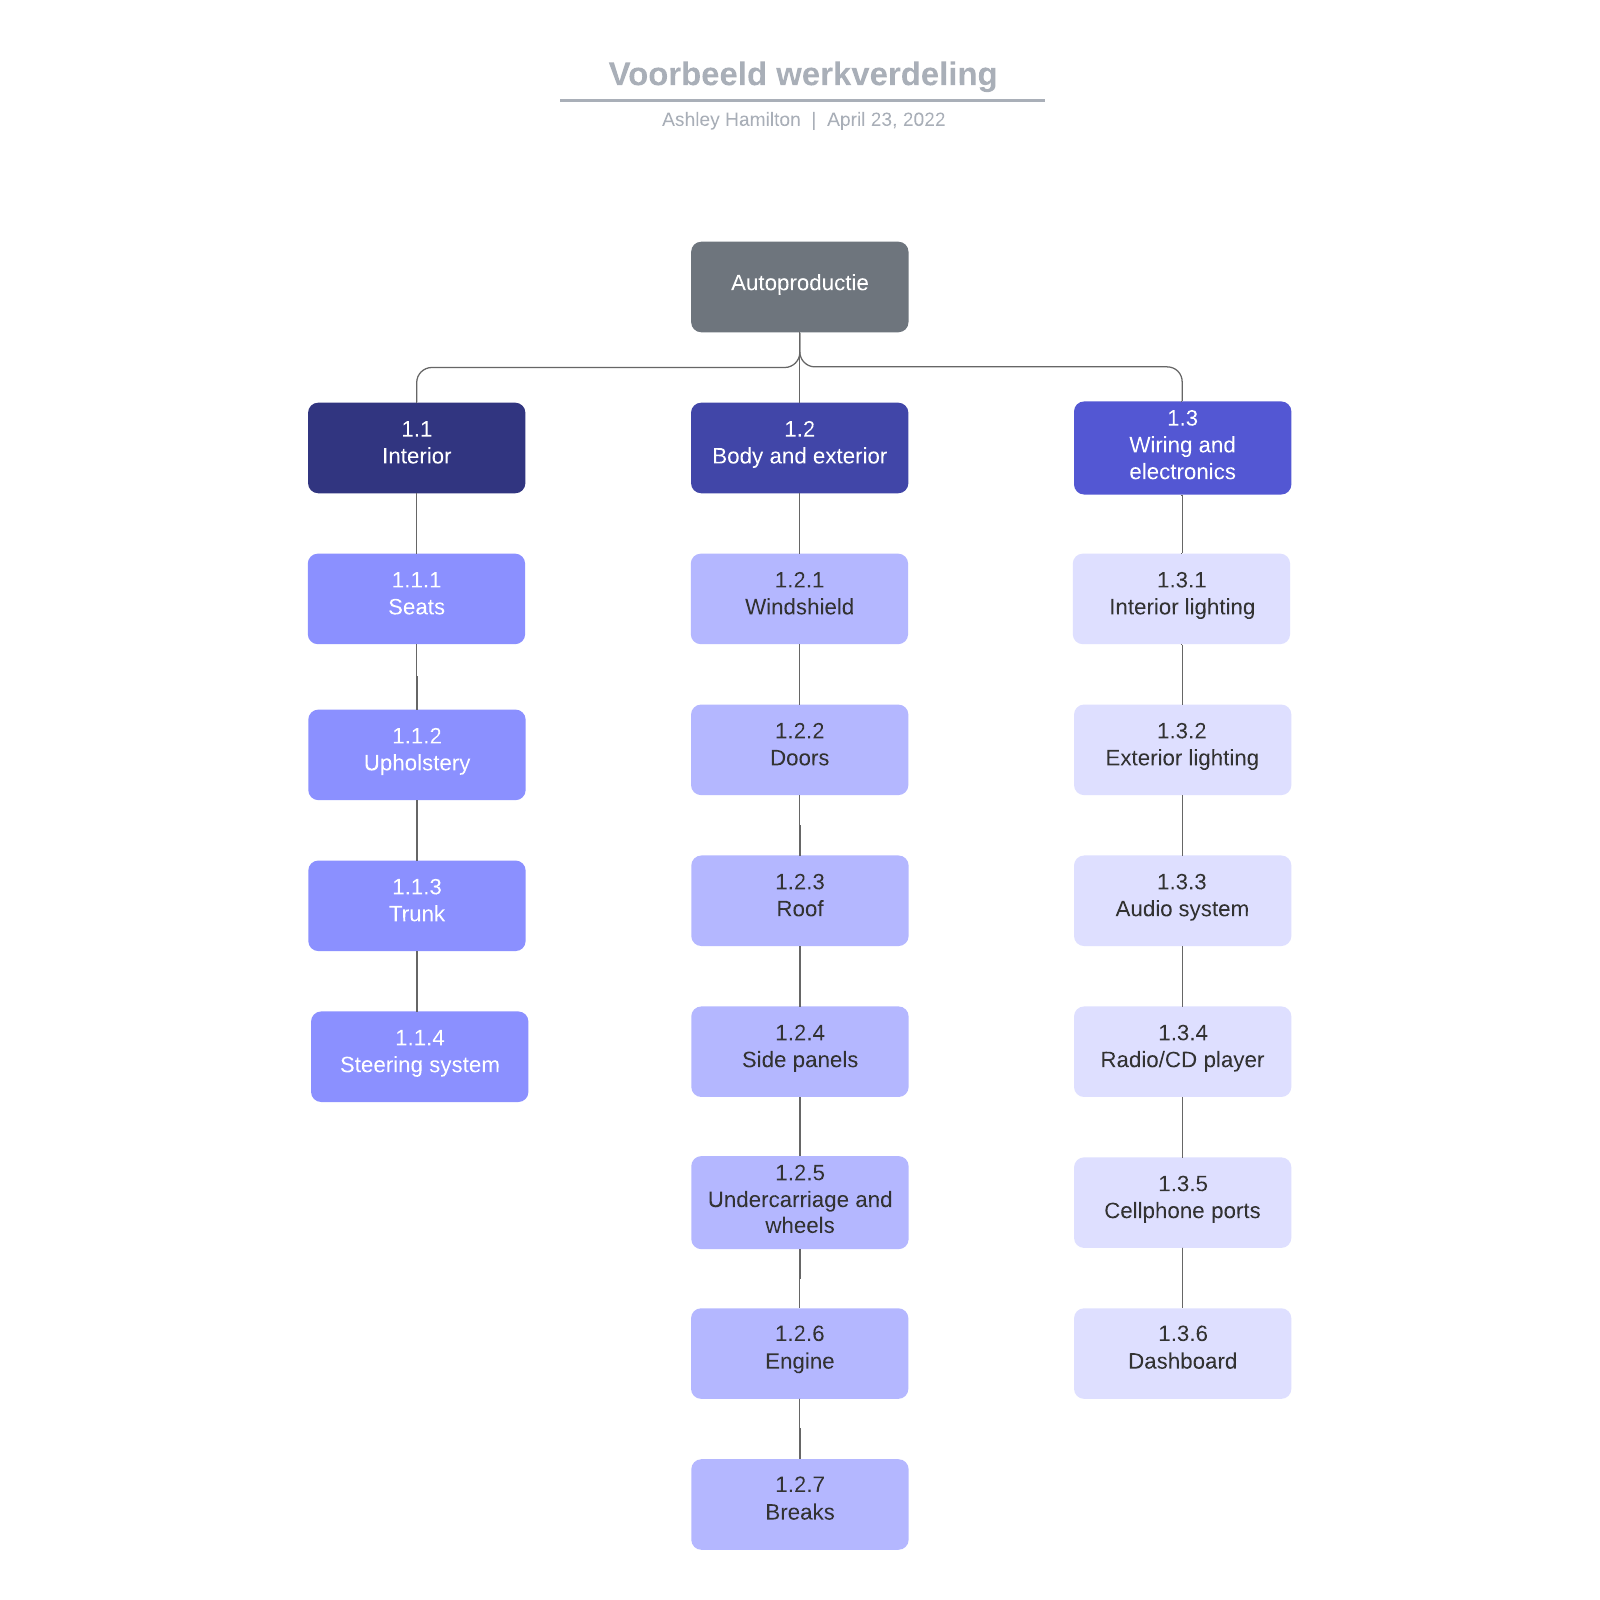 Voorbeeld werkverdeling